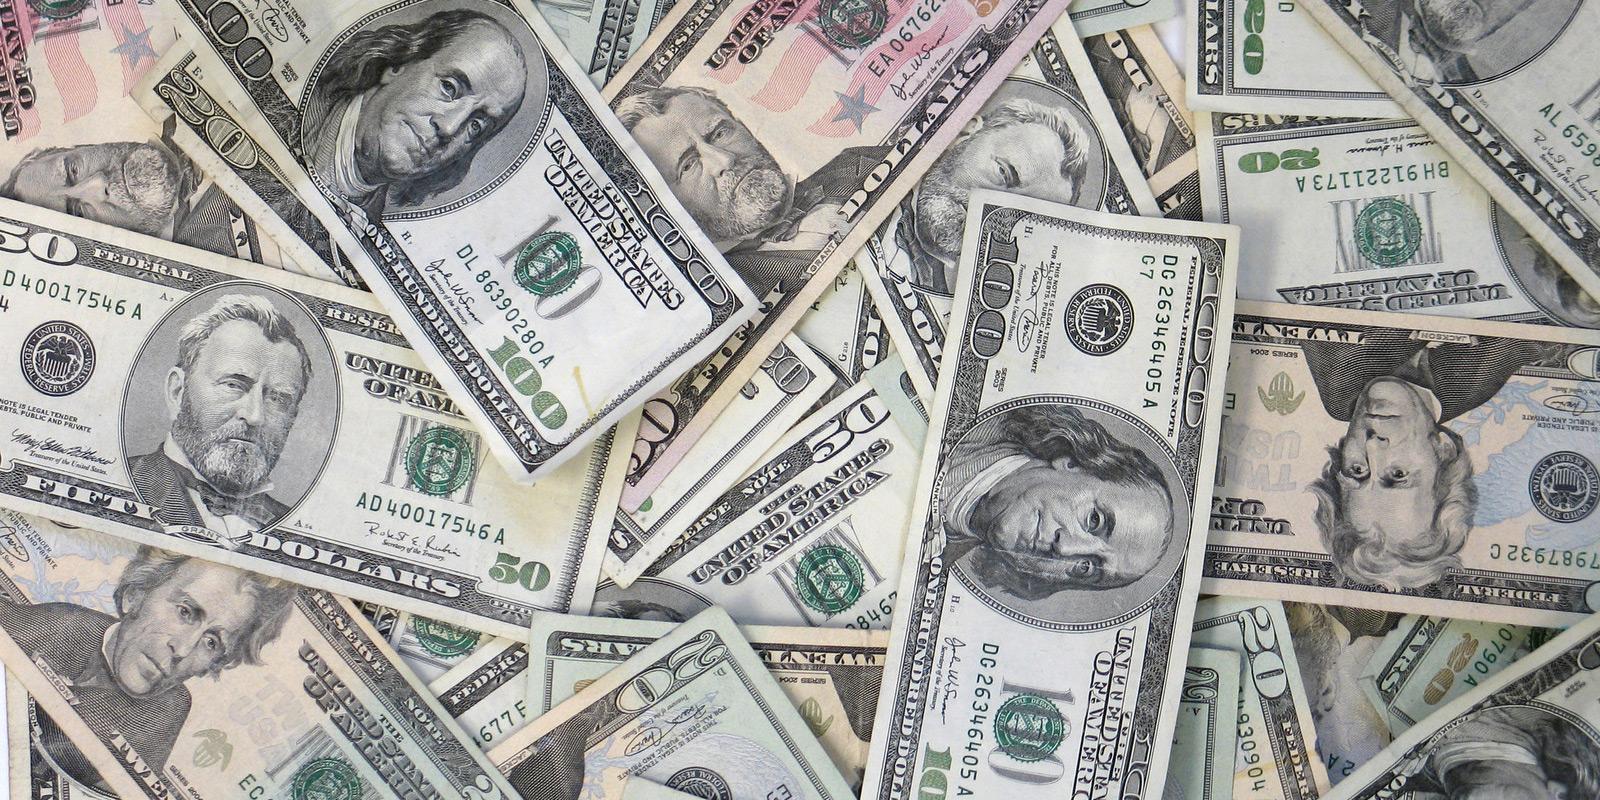 ccwsp fee money